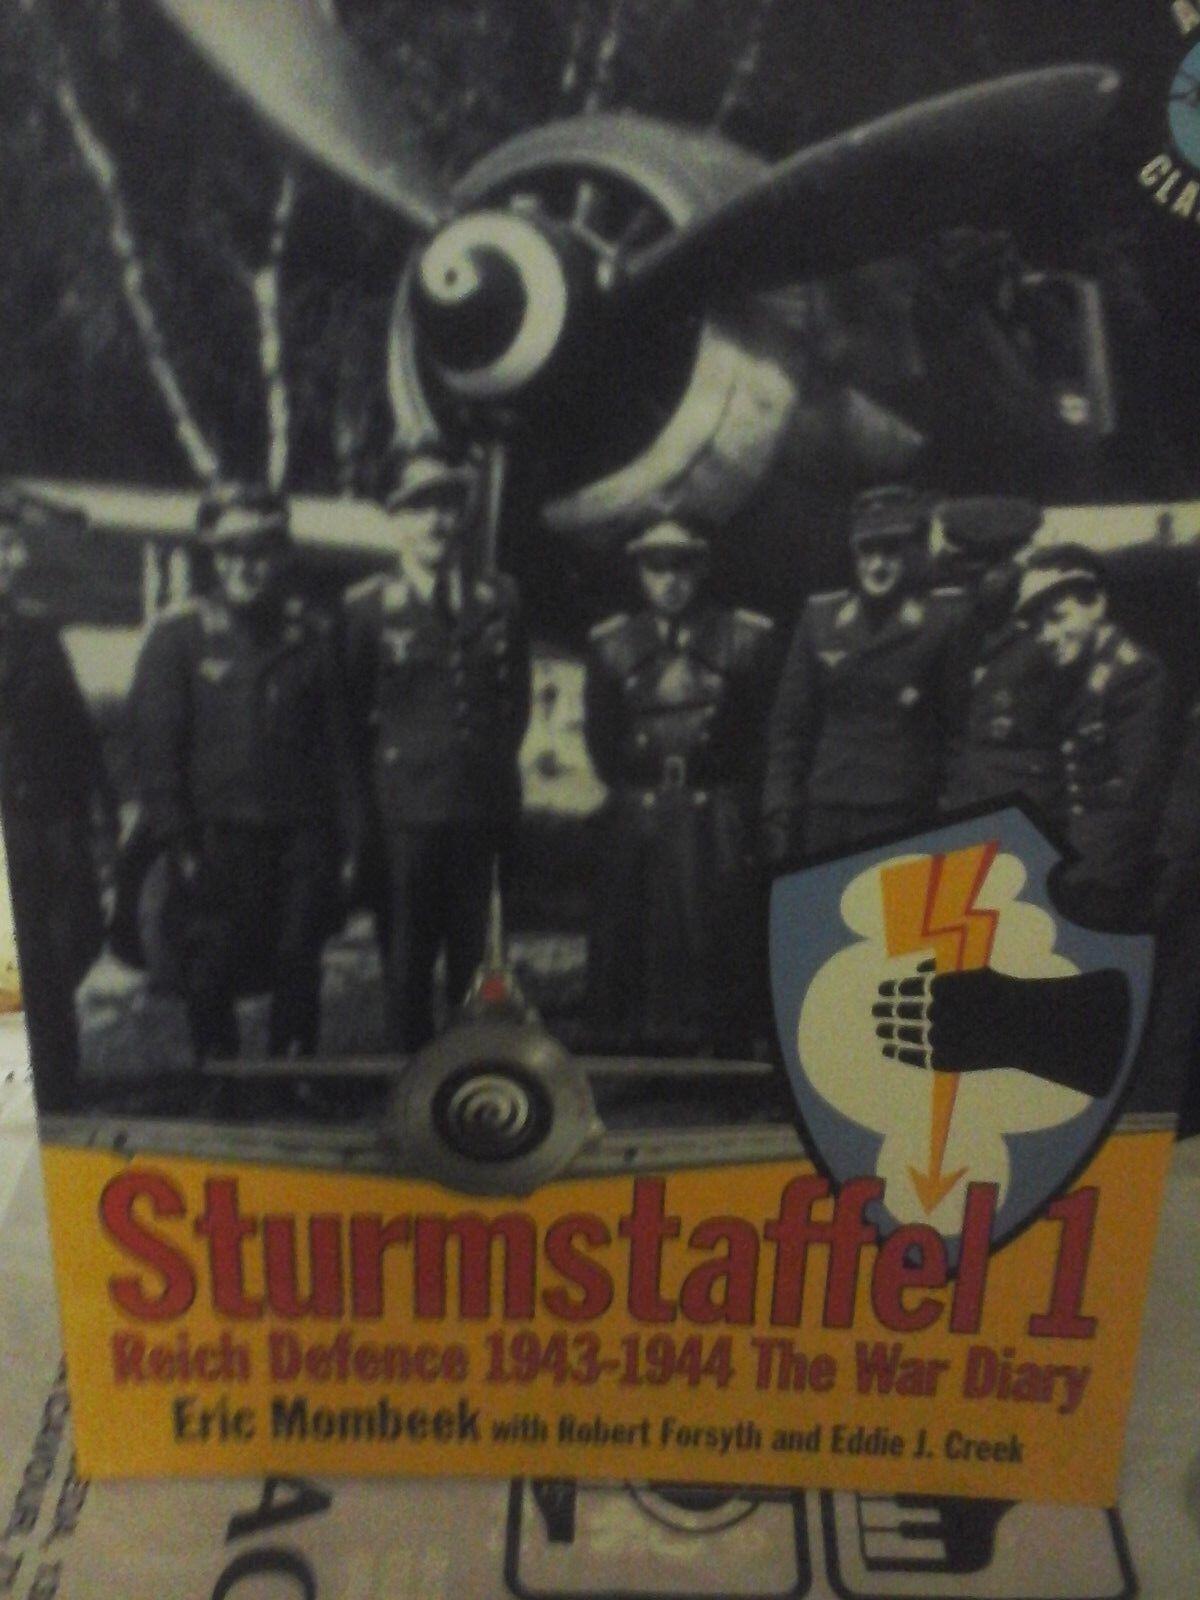 el más barato STURMSTAFFEL 1 REICH DEFENCE 1943 1944 THE THE THE WAR DIARY-BY E.MOMBEEK-CLASSIC PUBLIS  80% de descuento